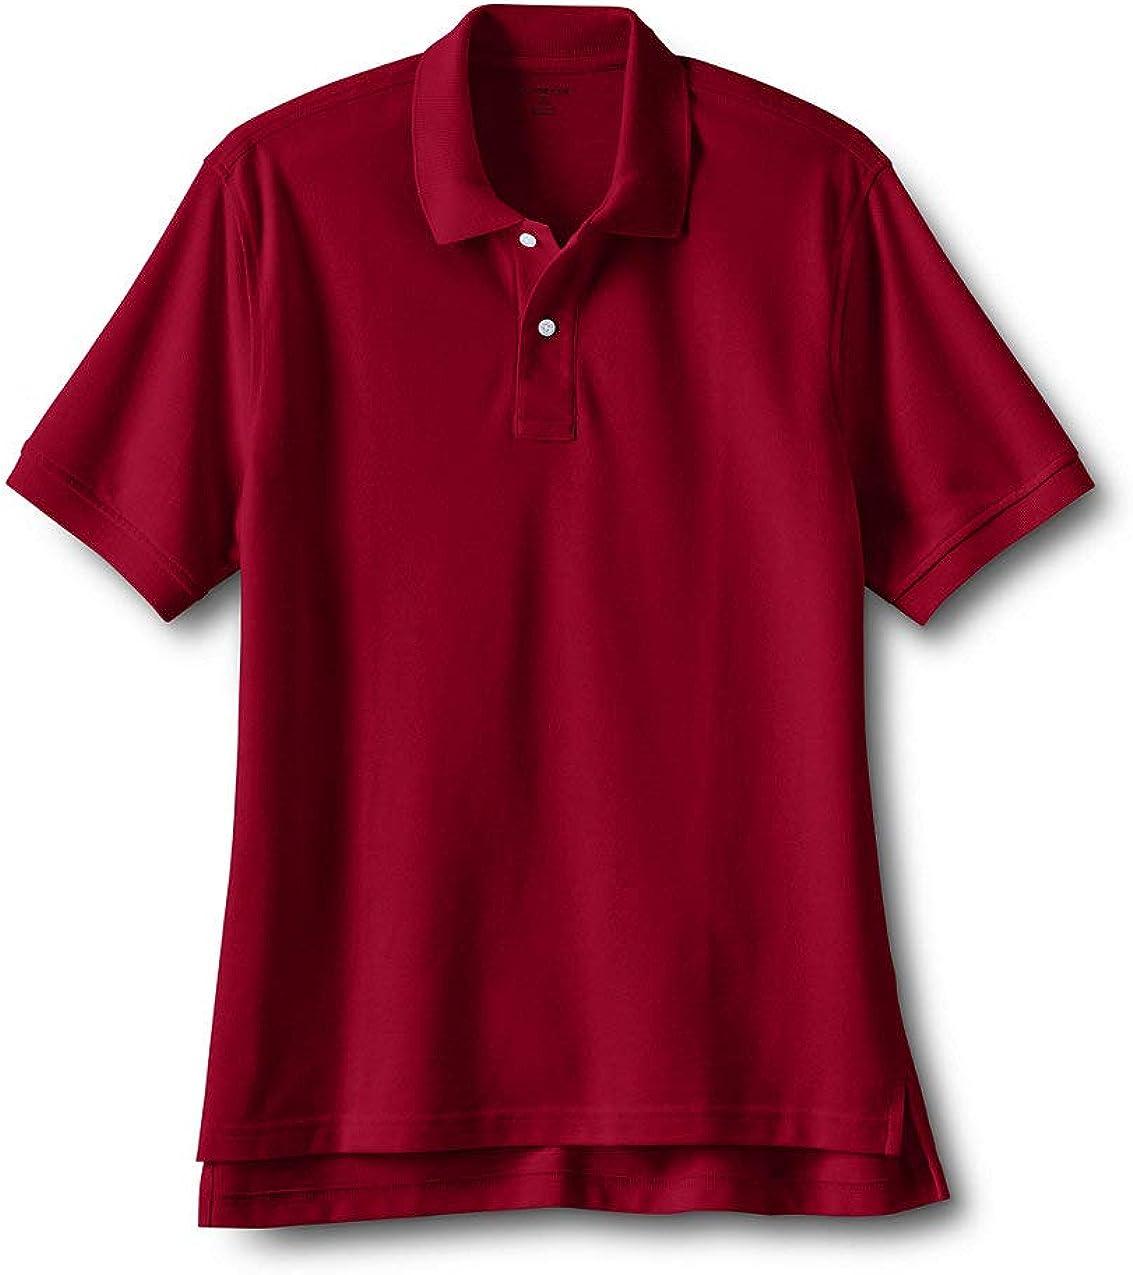 Lands' End School Uniform Men's Short Sleeve Mesh Polo Shirt